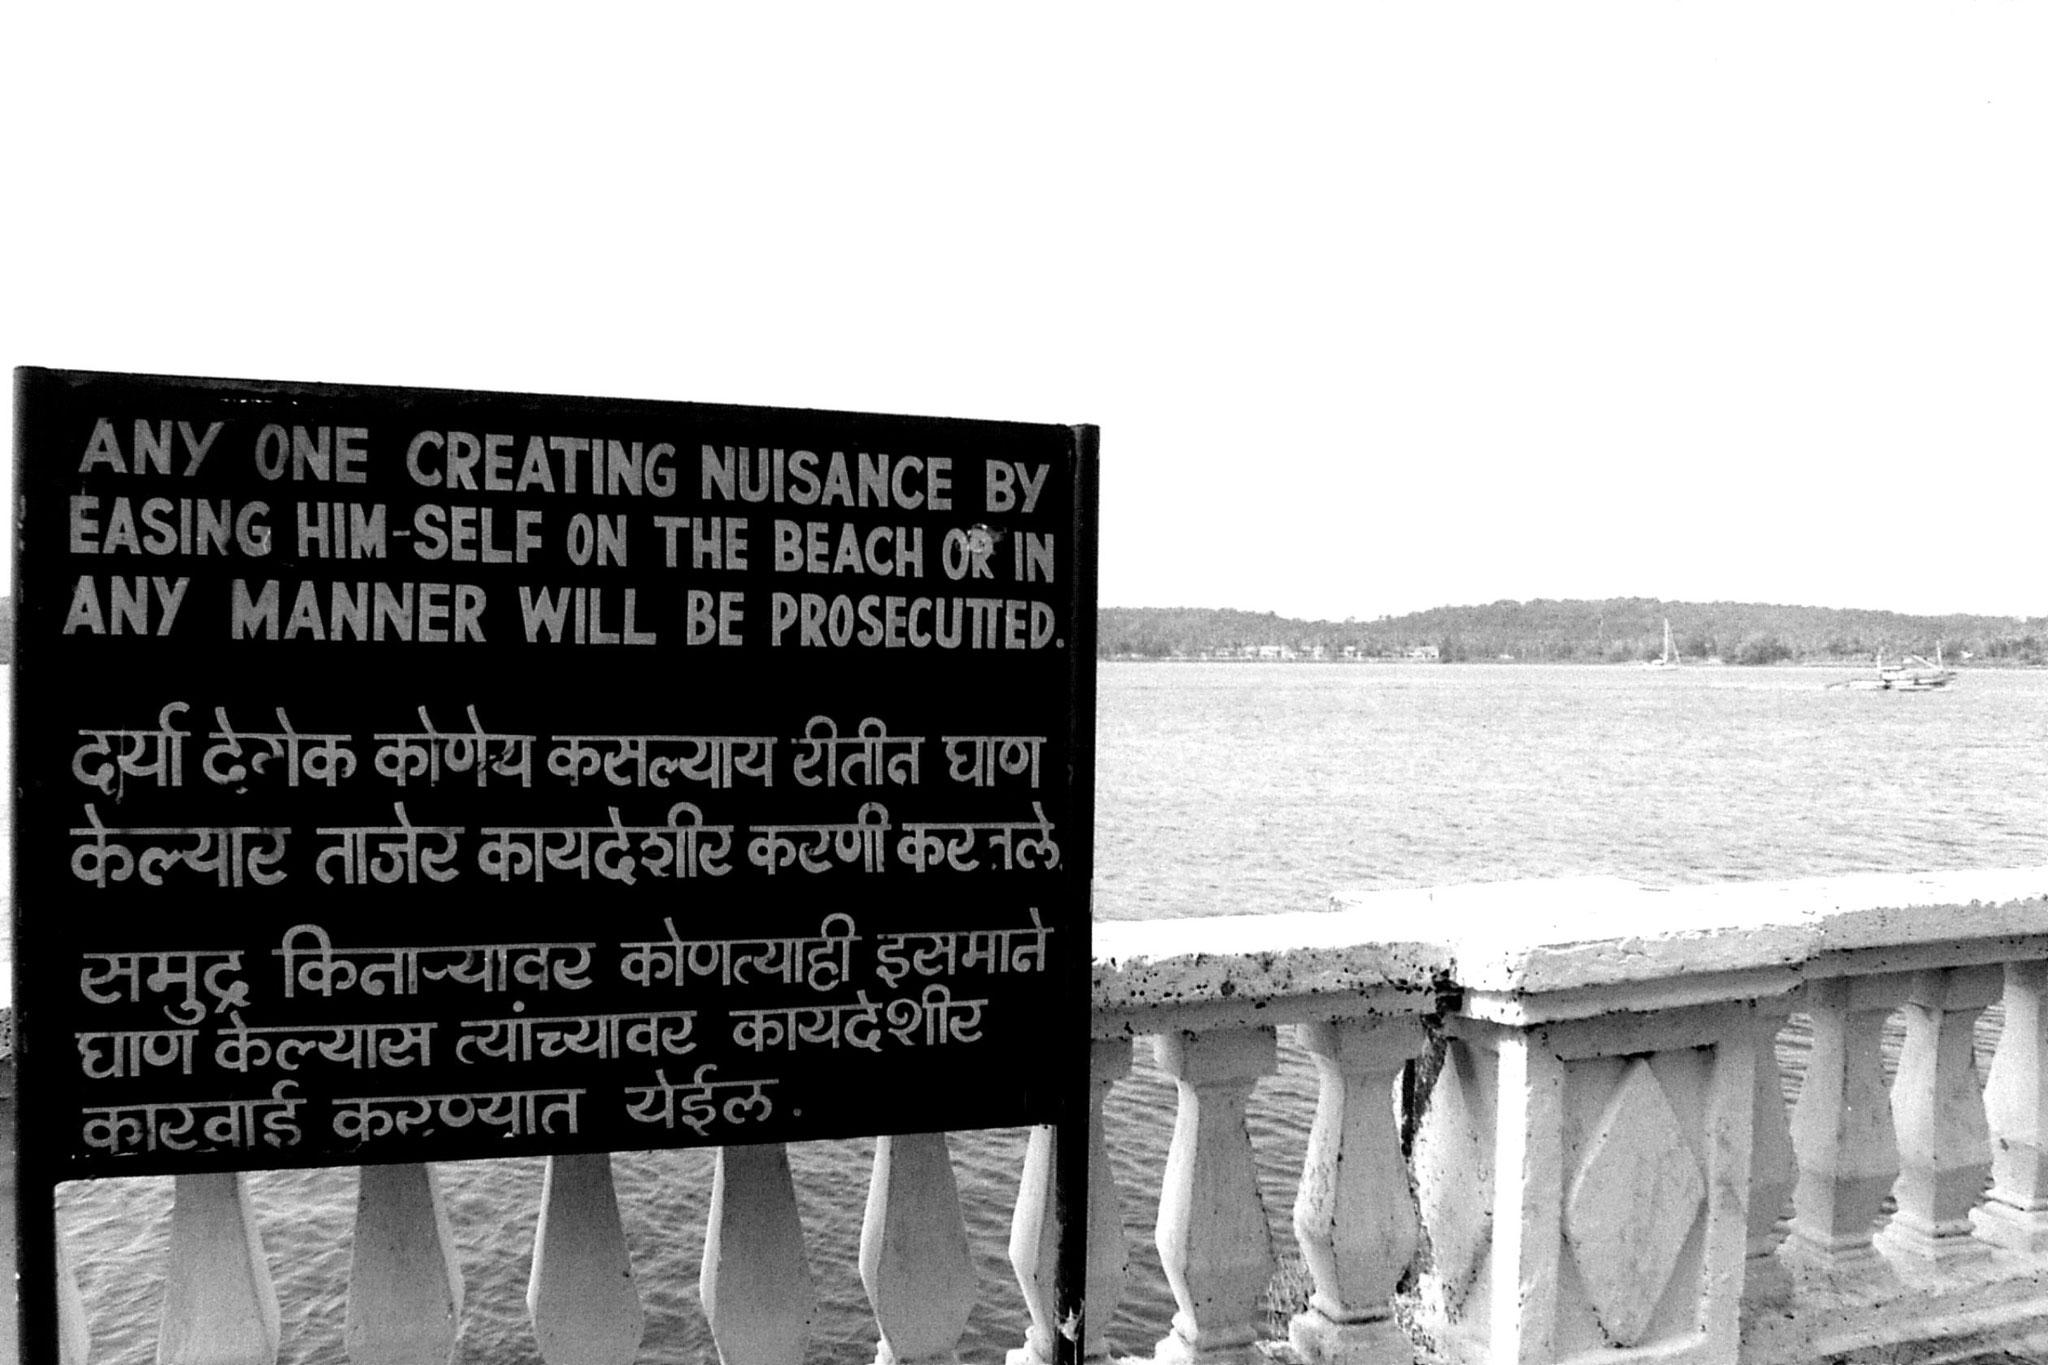 29/12/1989: 34: Panjim Goa sign on promenade